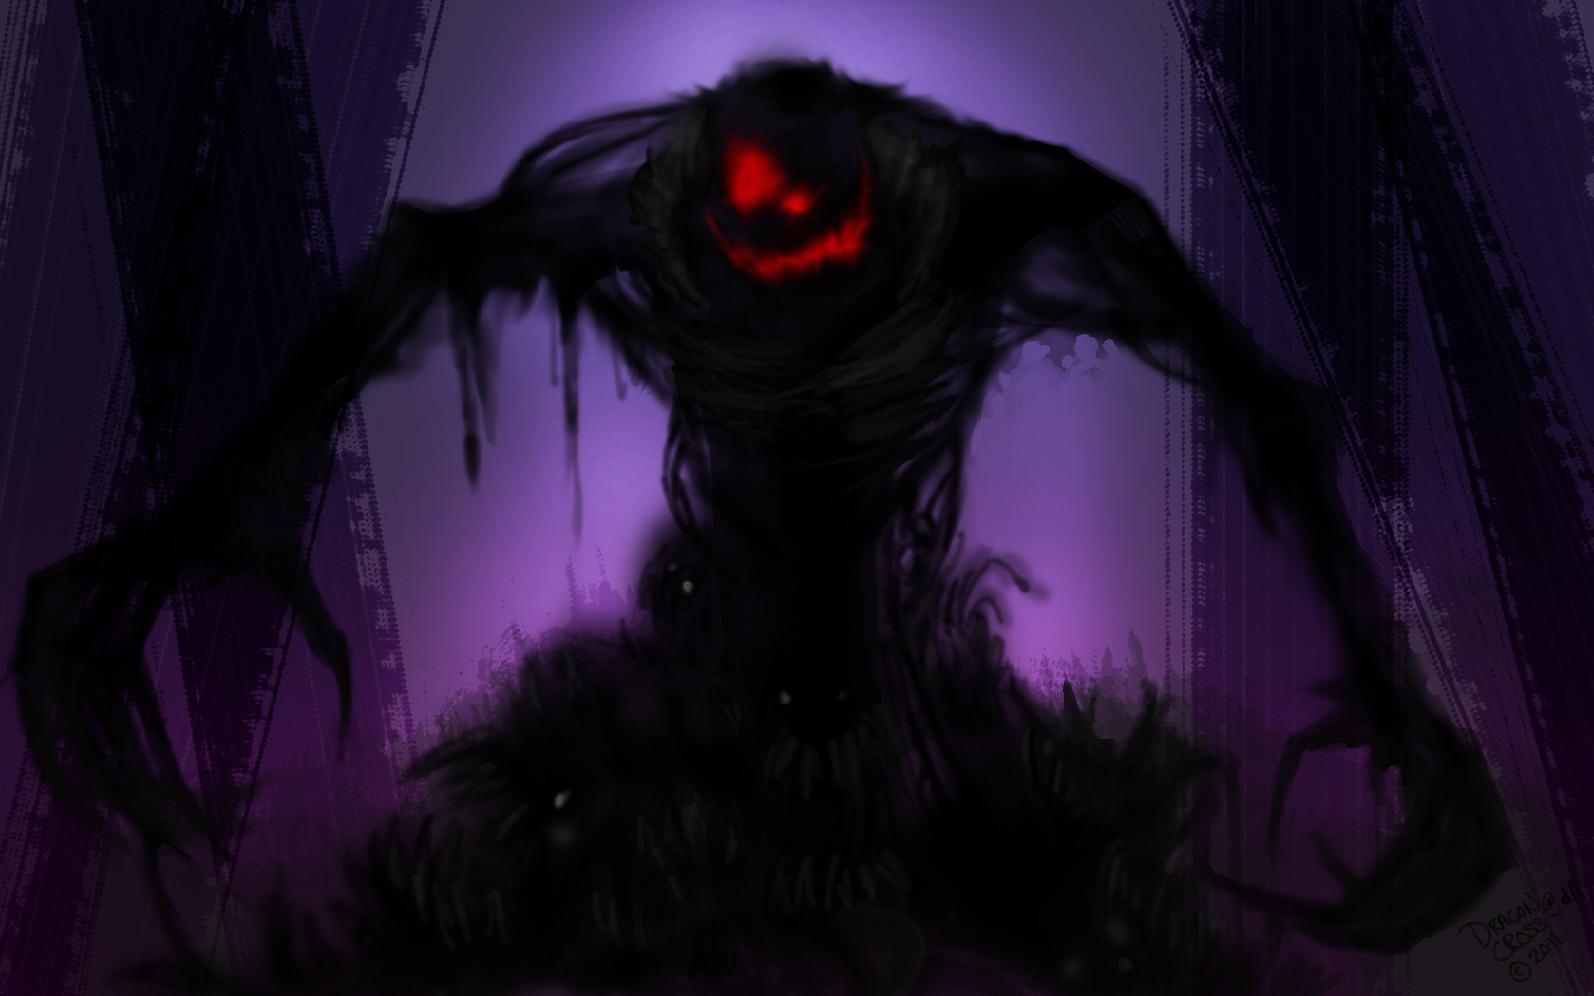 Insidious Demon... Insidious Demon